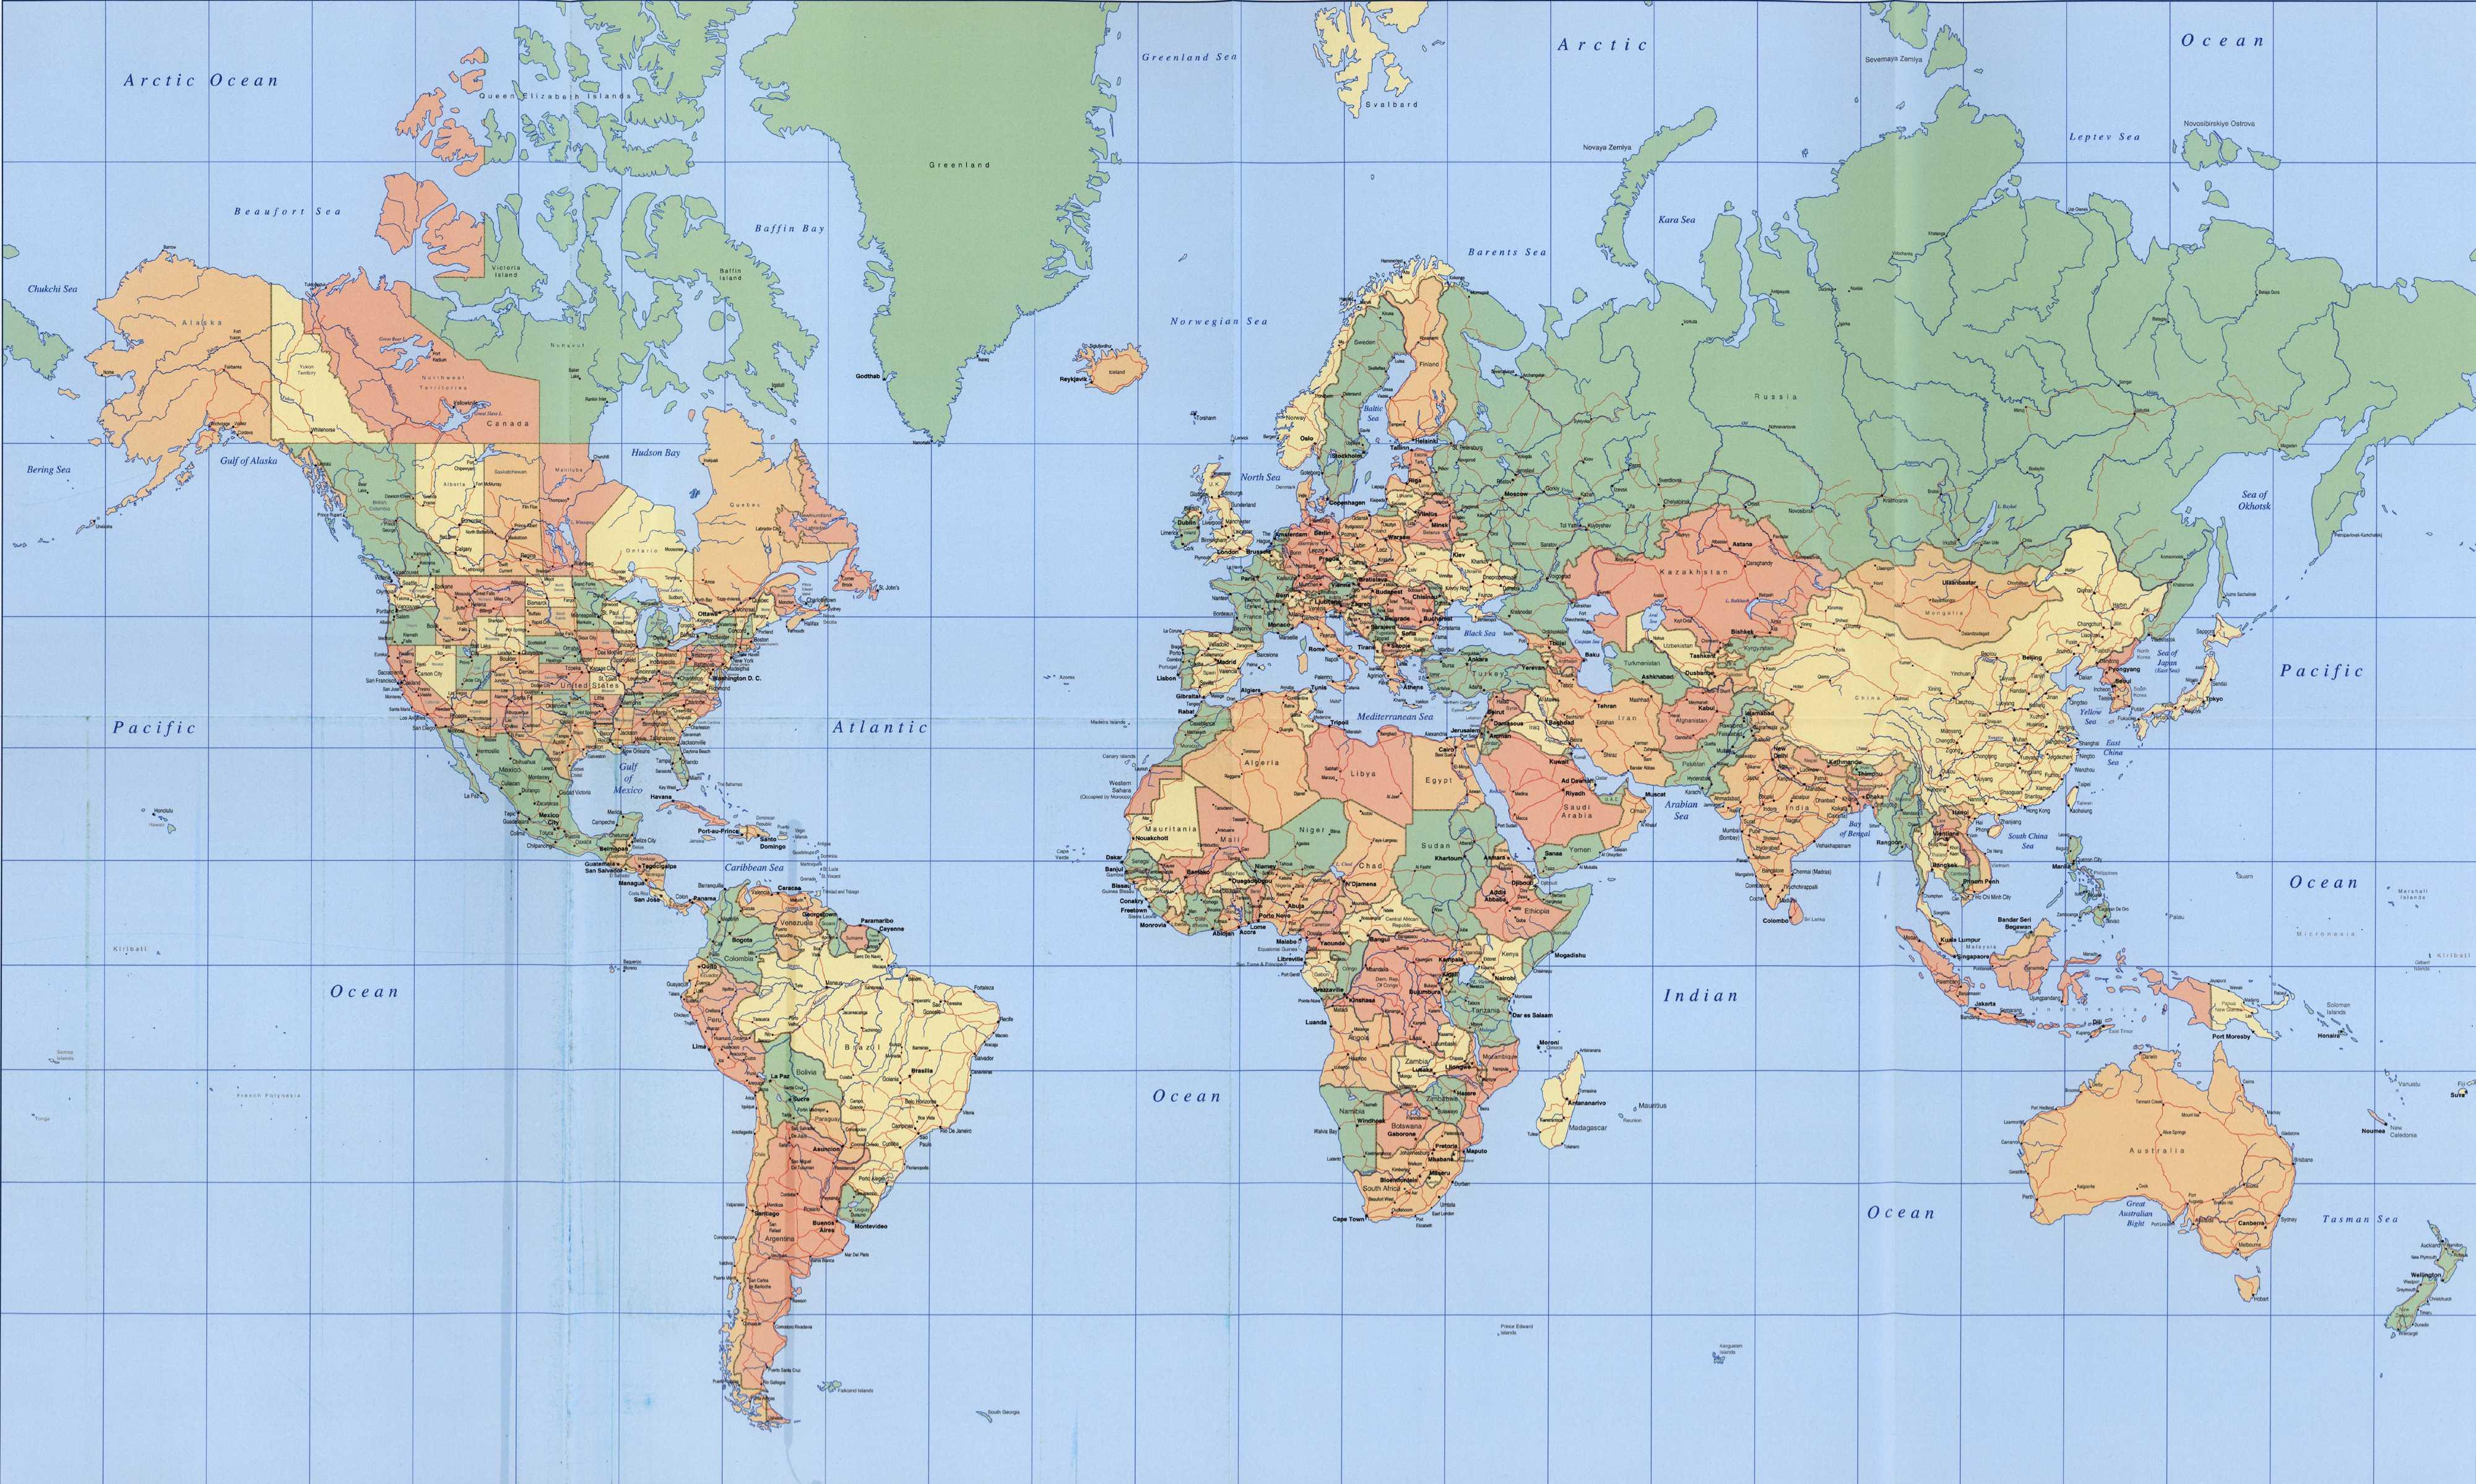 Siapkan gambar peta dunia ...